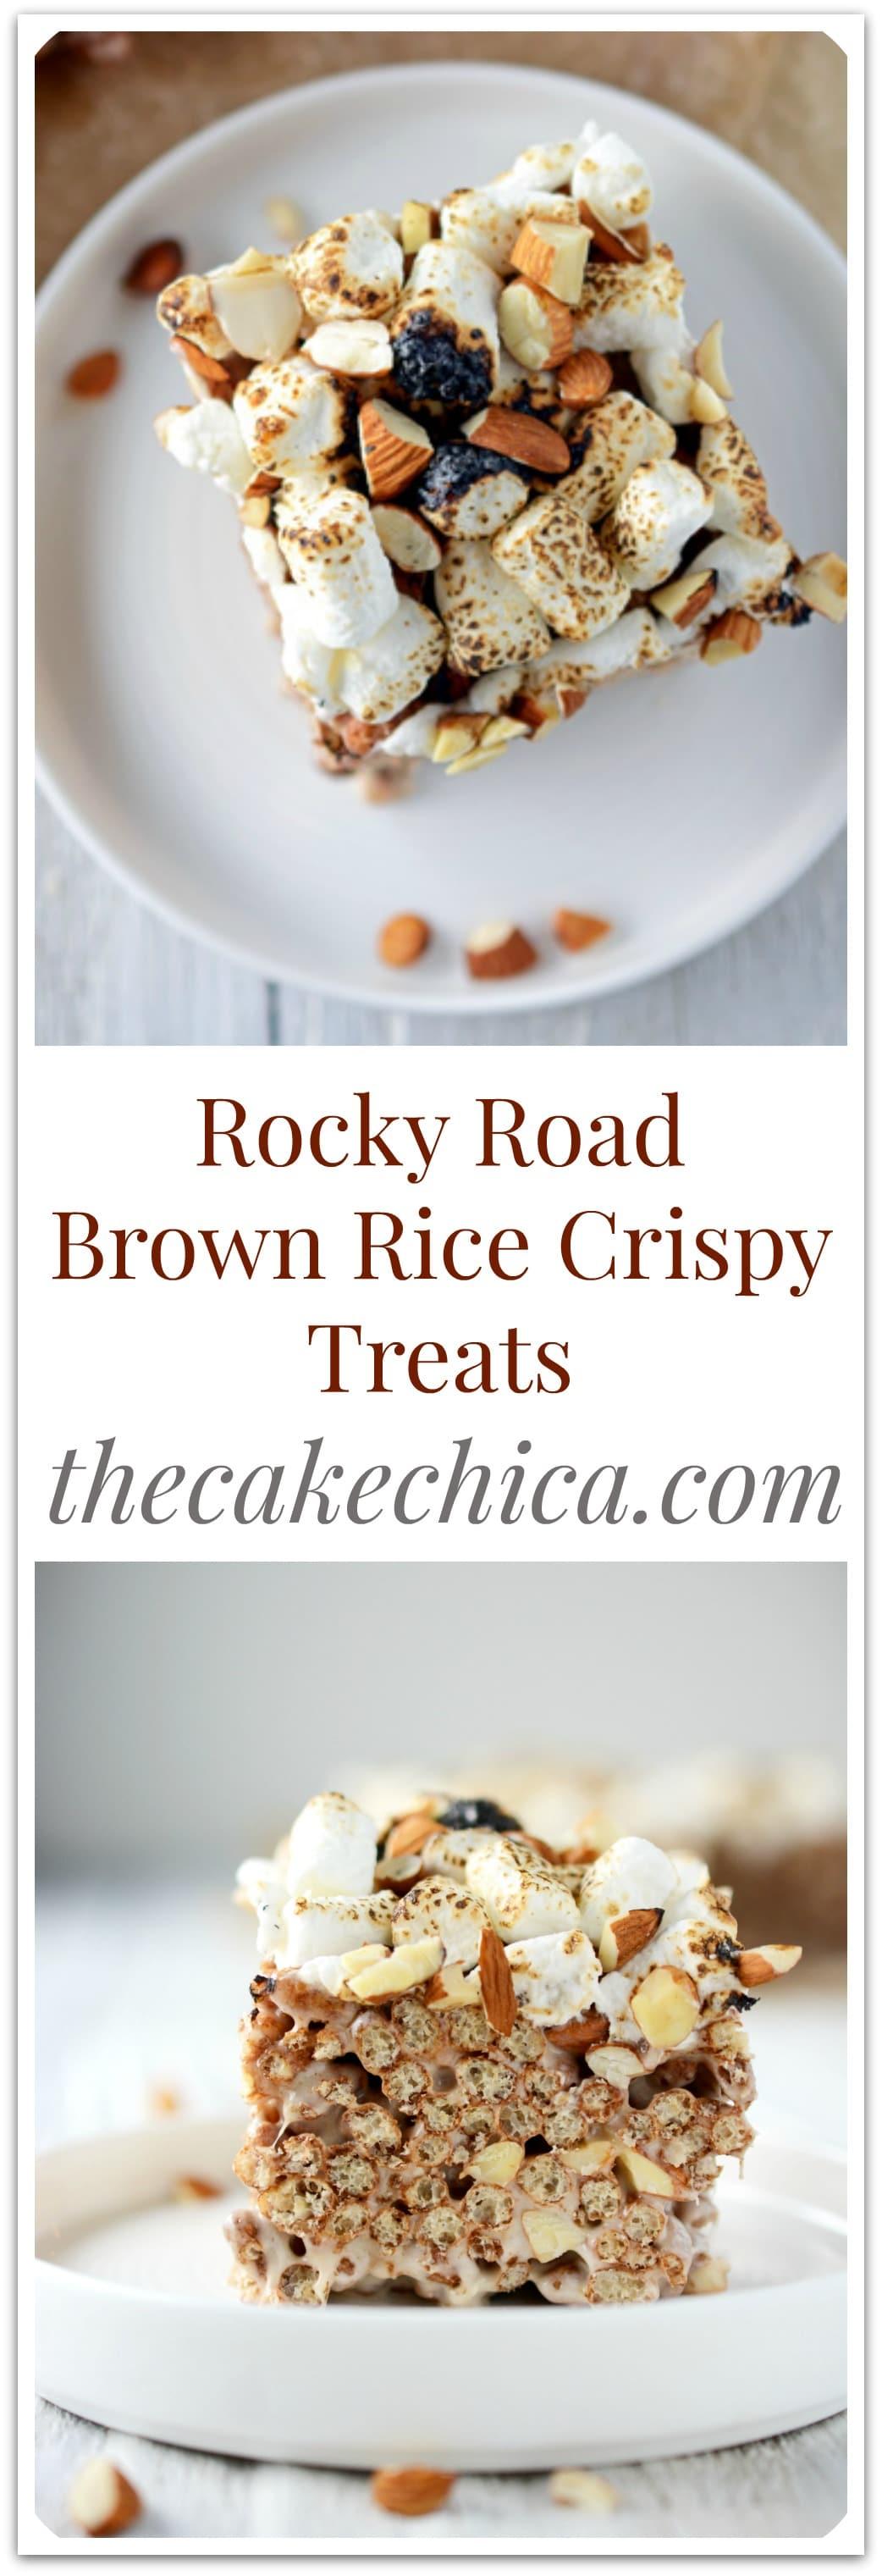 Rocky Road Brown Rice Crispy Treats